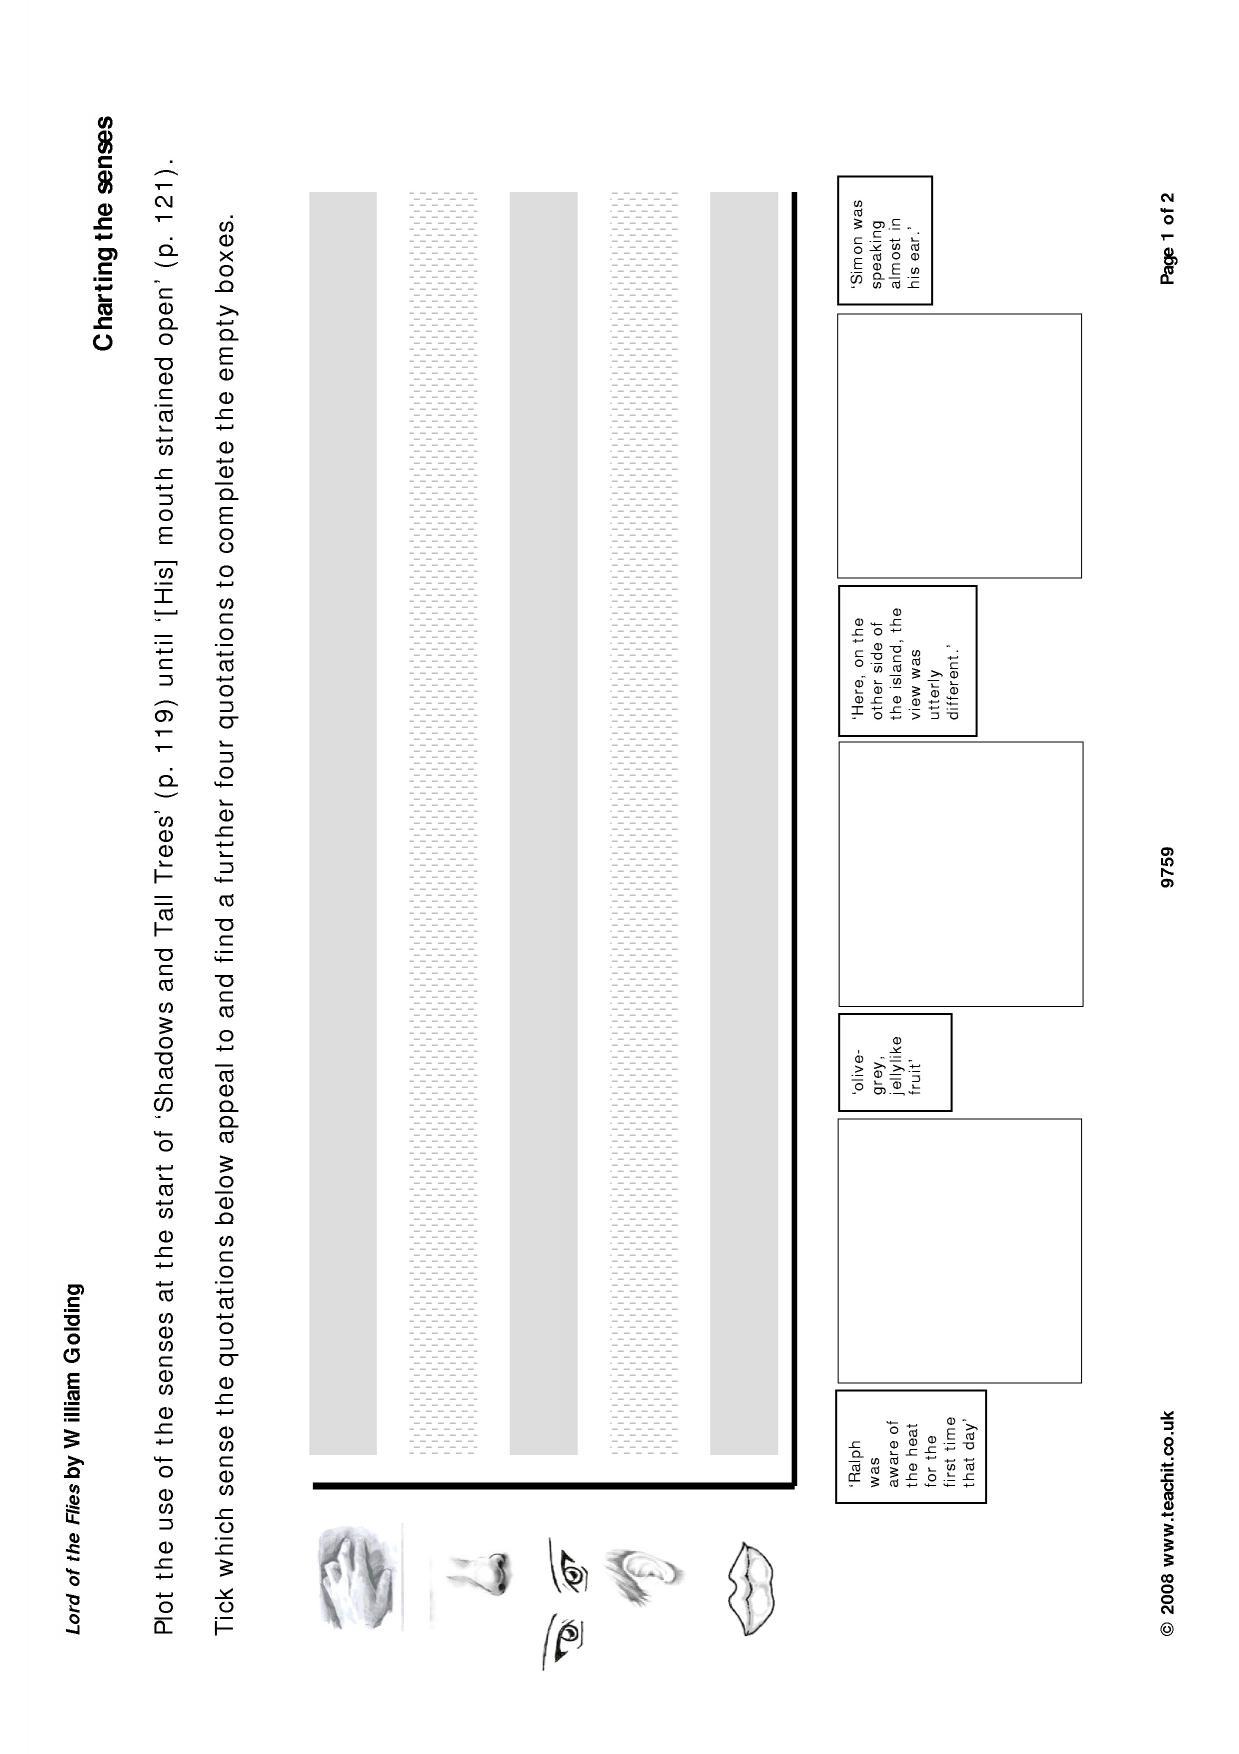 lord of the flies plot diagram dicot stem ks4 prose by william golding teachit